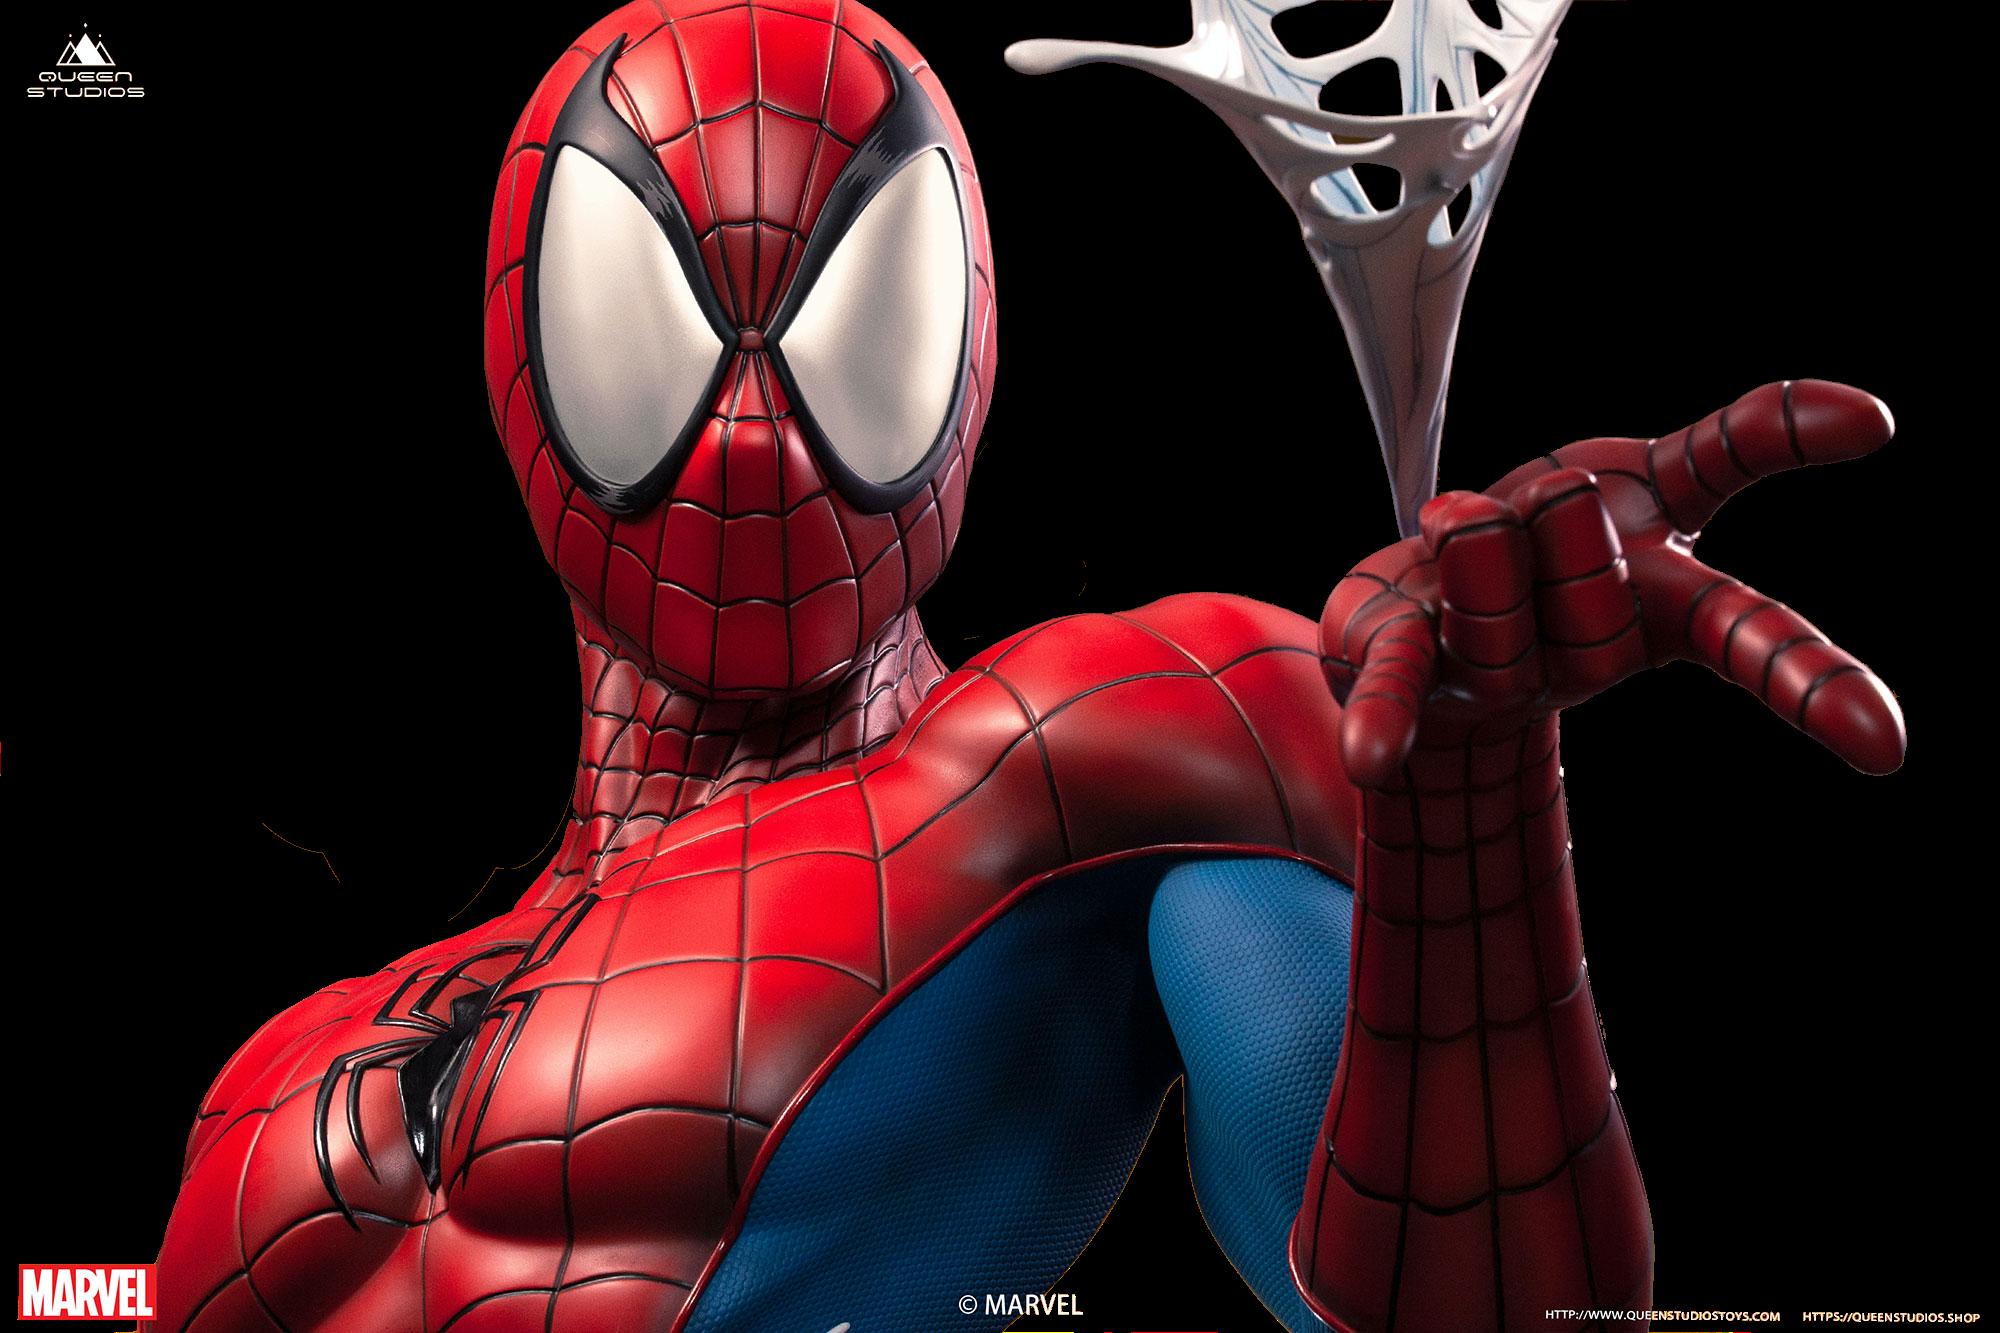 queen-studios-marvel-comics-spiderman-classic-lifesize-bust-toyslife